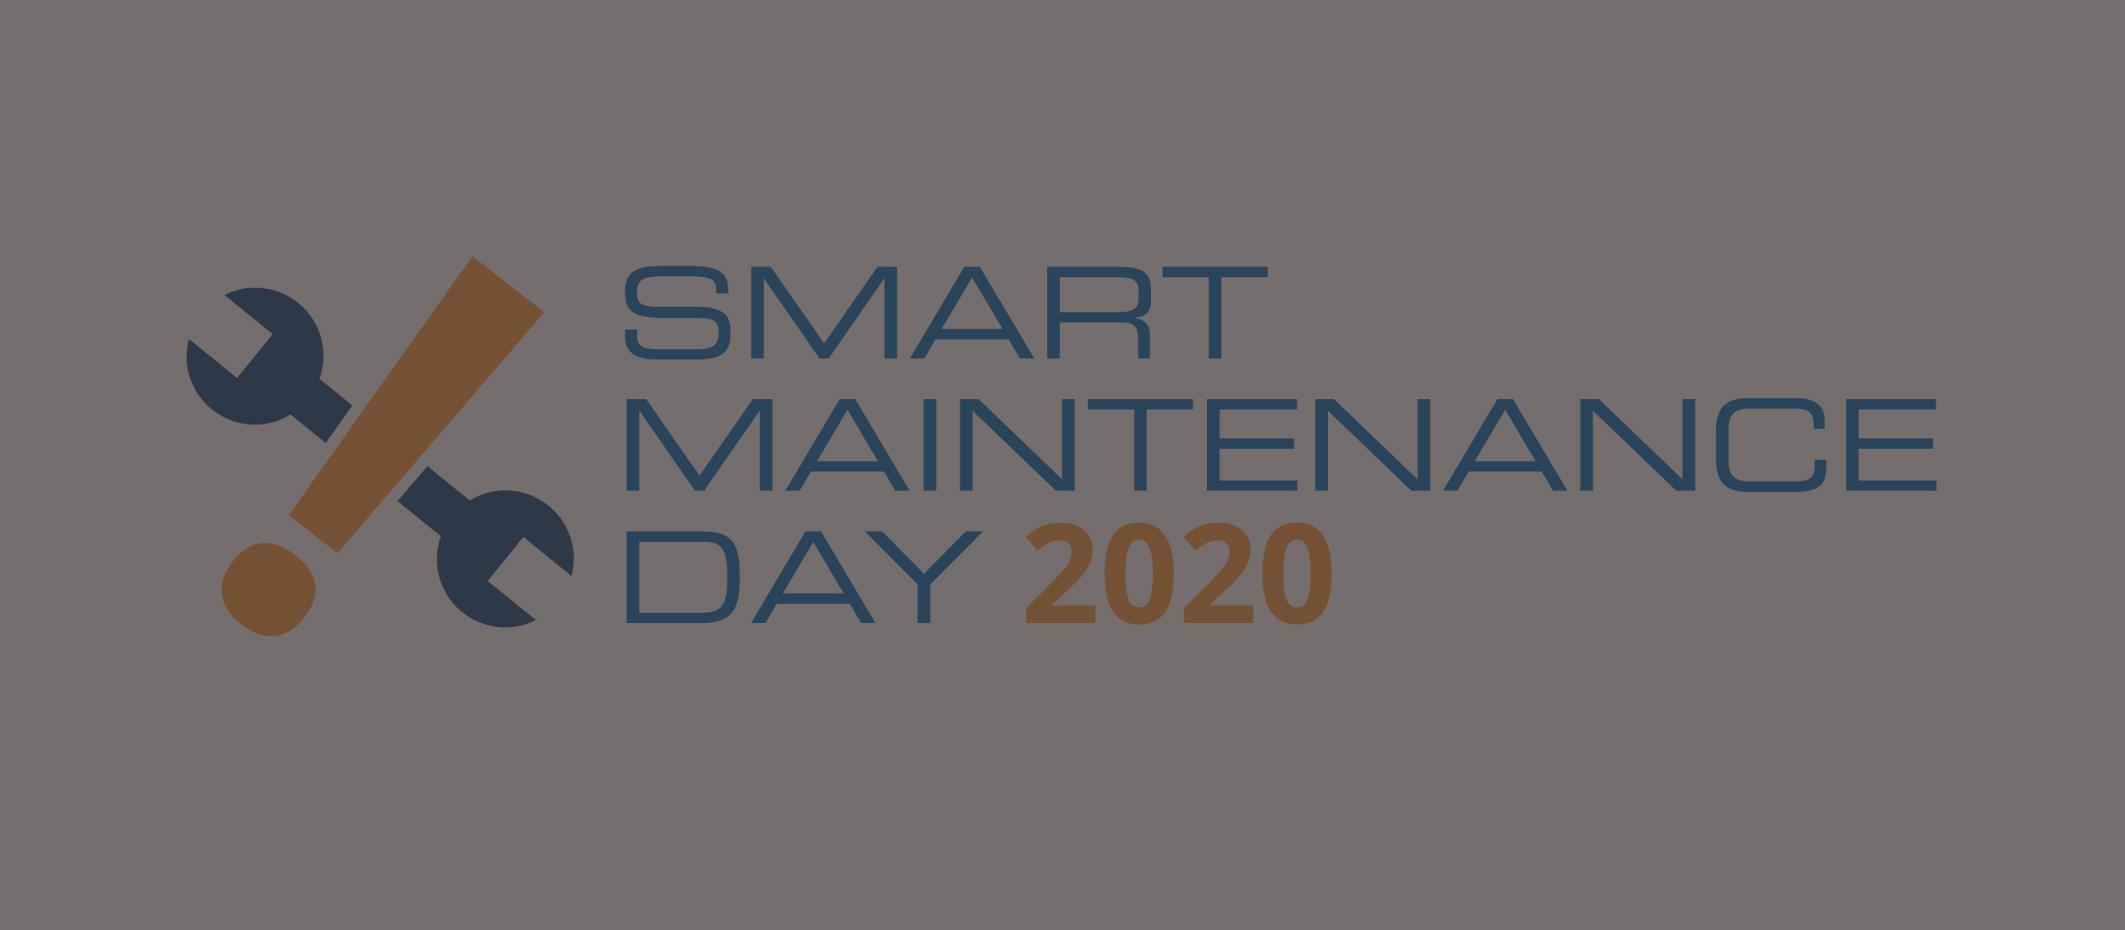 PRAXISTAG: Smart Maintenance 24.09.2020